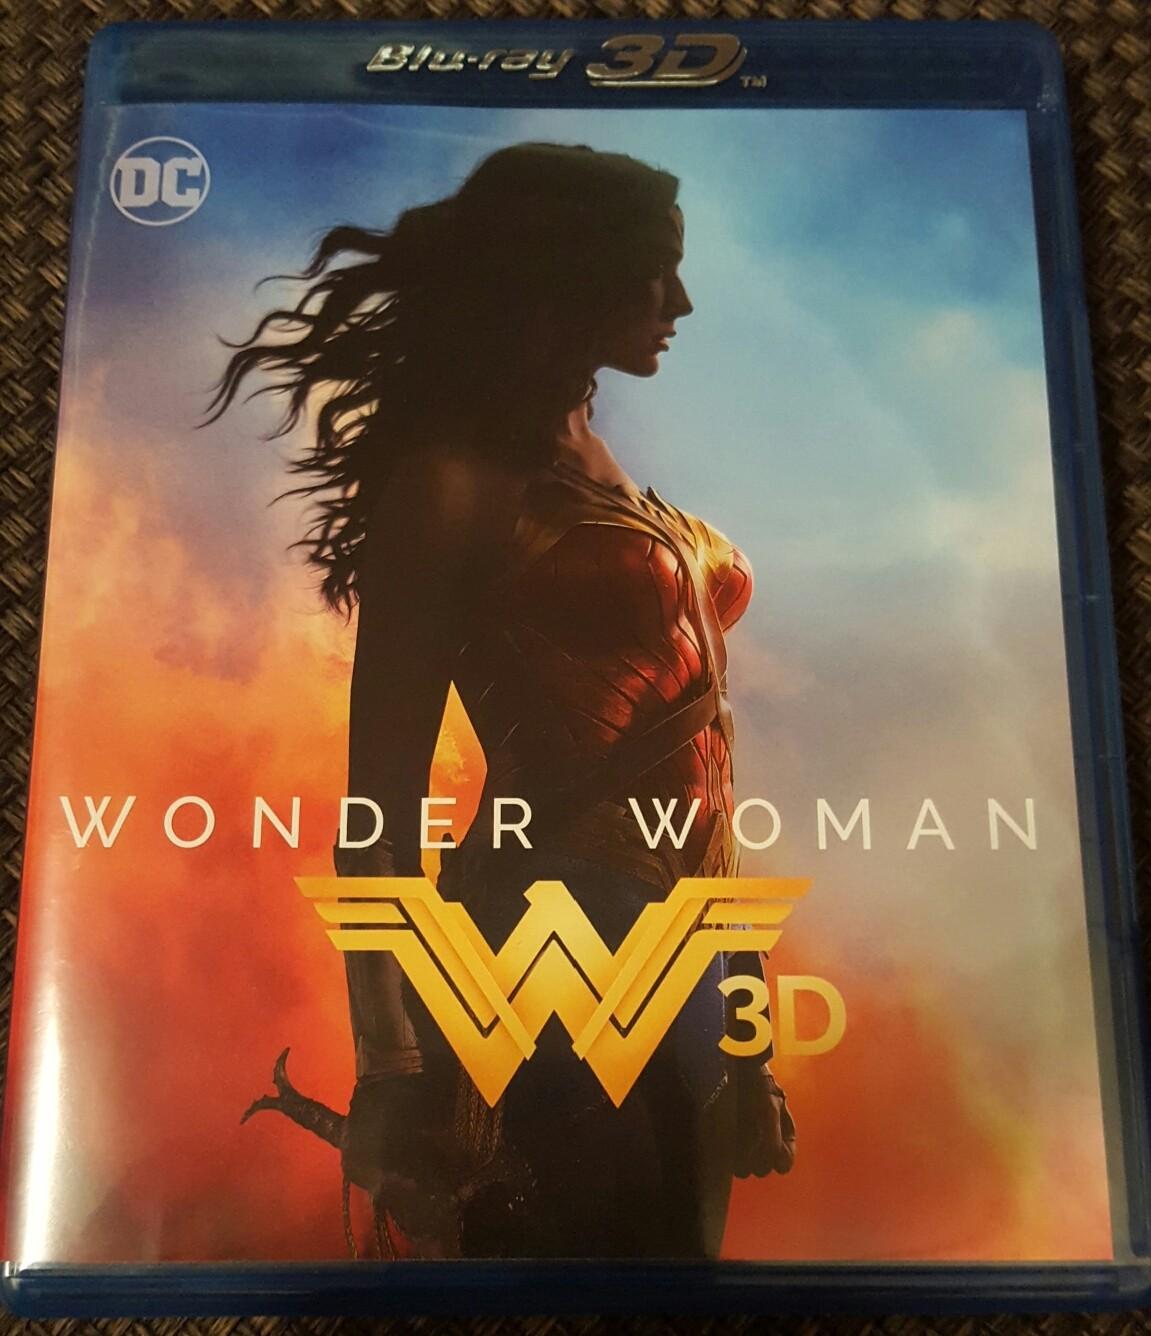 Wonder Woman Front.jpg